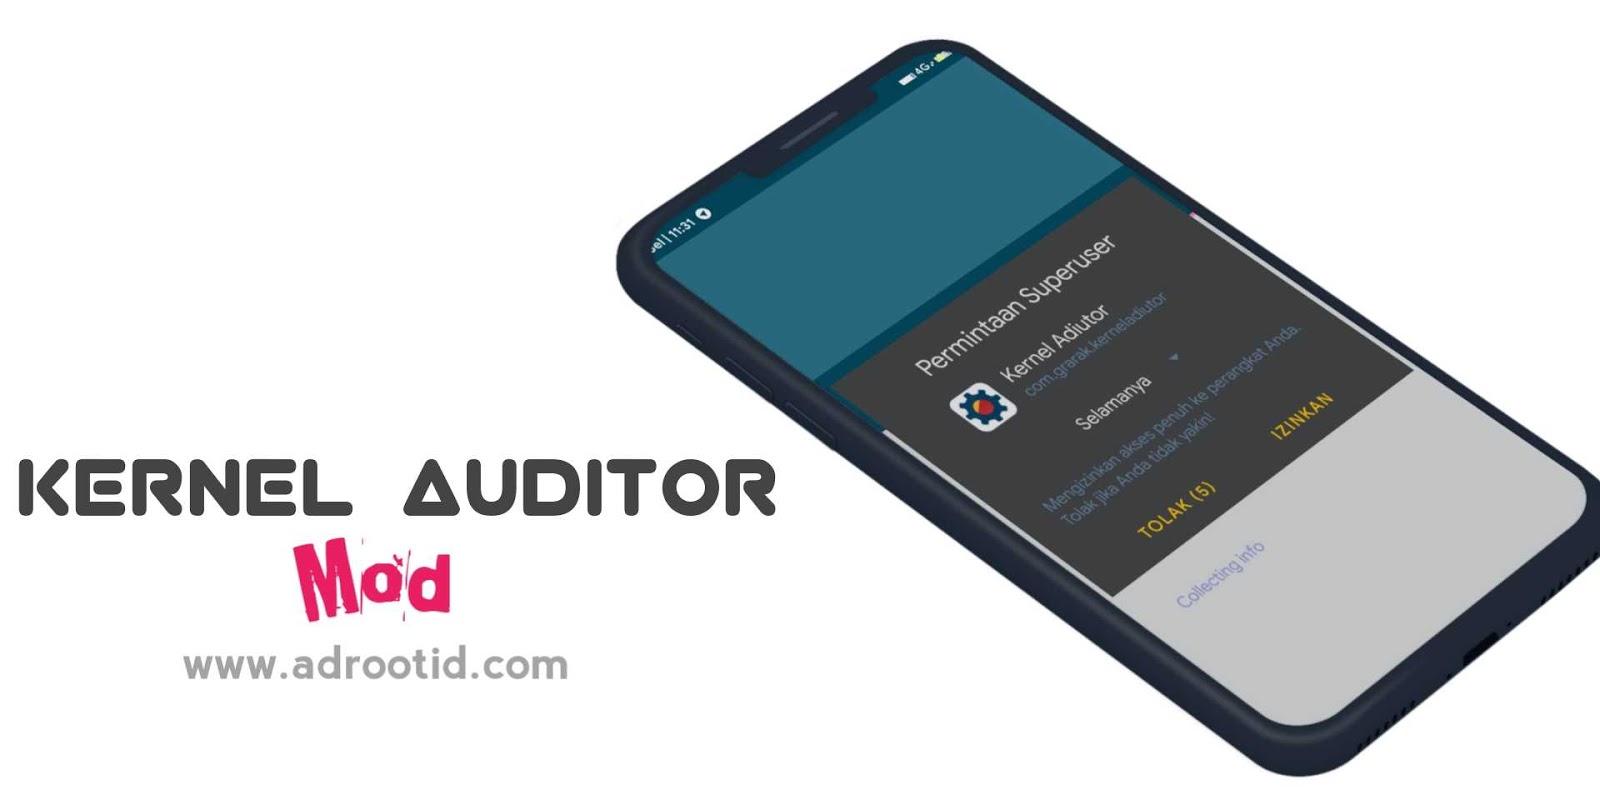 Kernel Auditor Mod apk